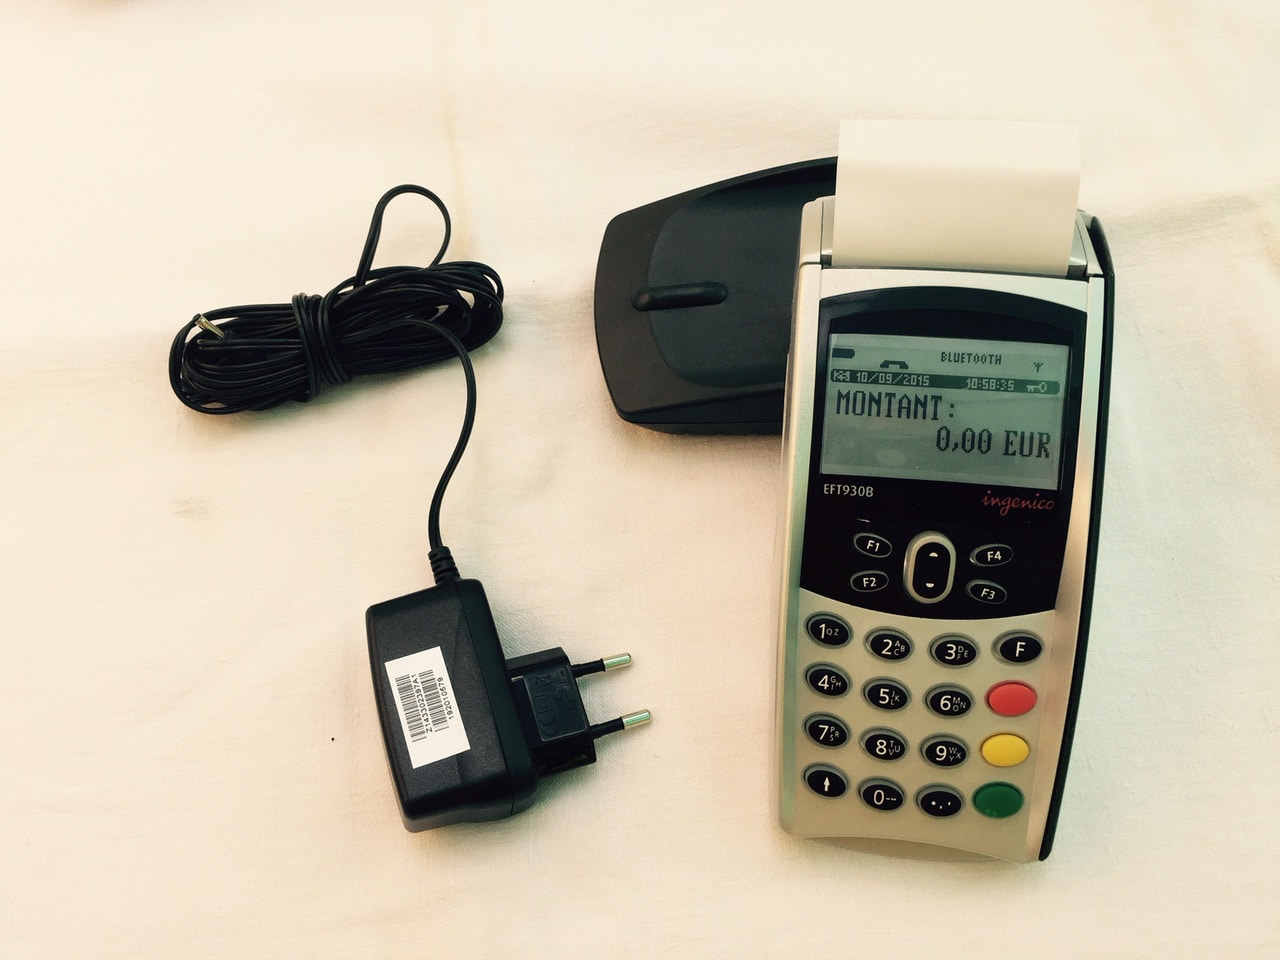 Terminal de paiement portable gprs occasion 195 ht for Mobel occasion